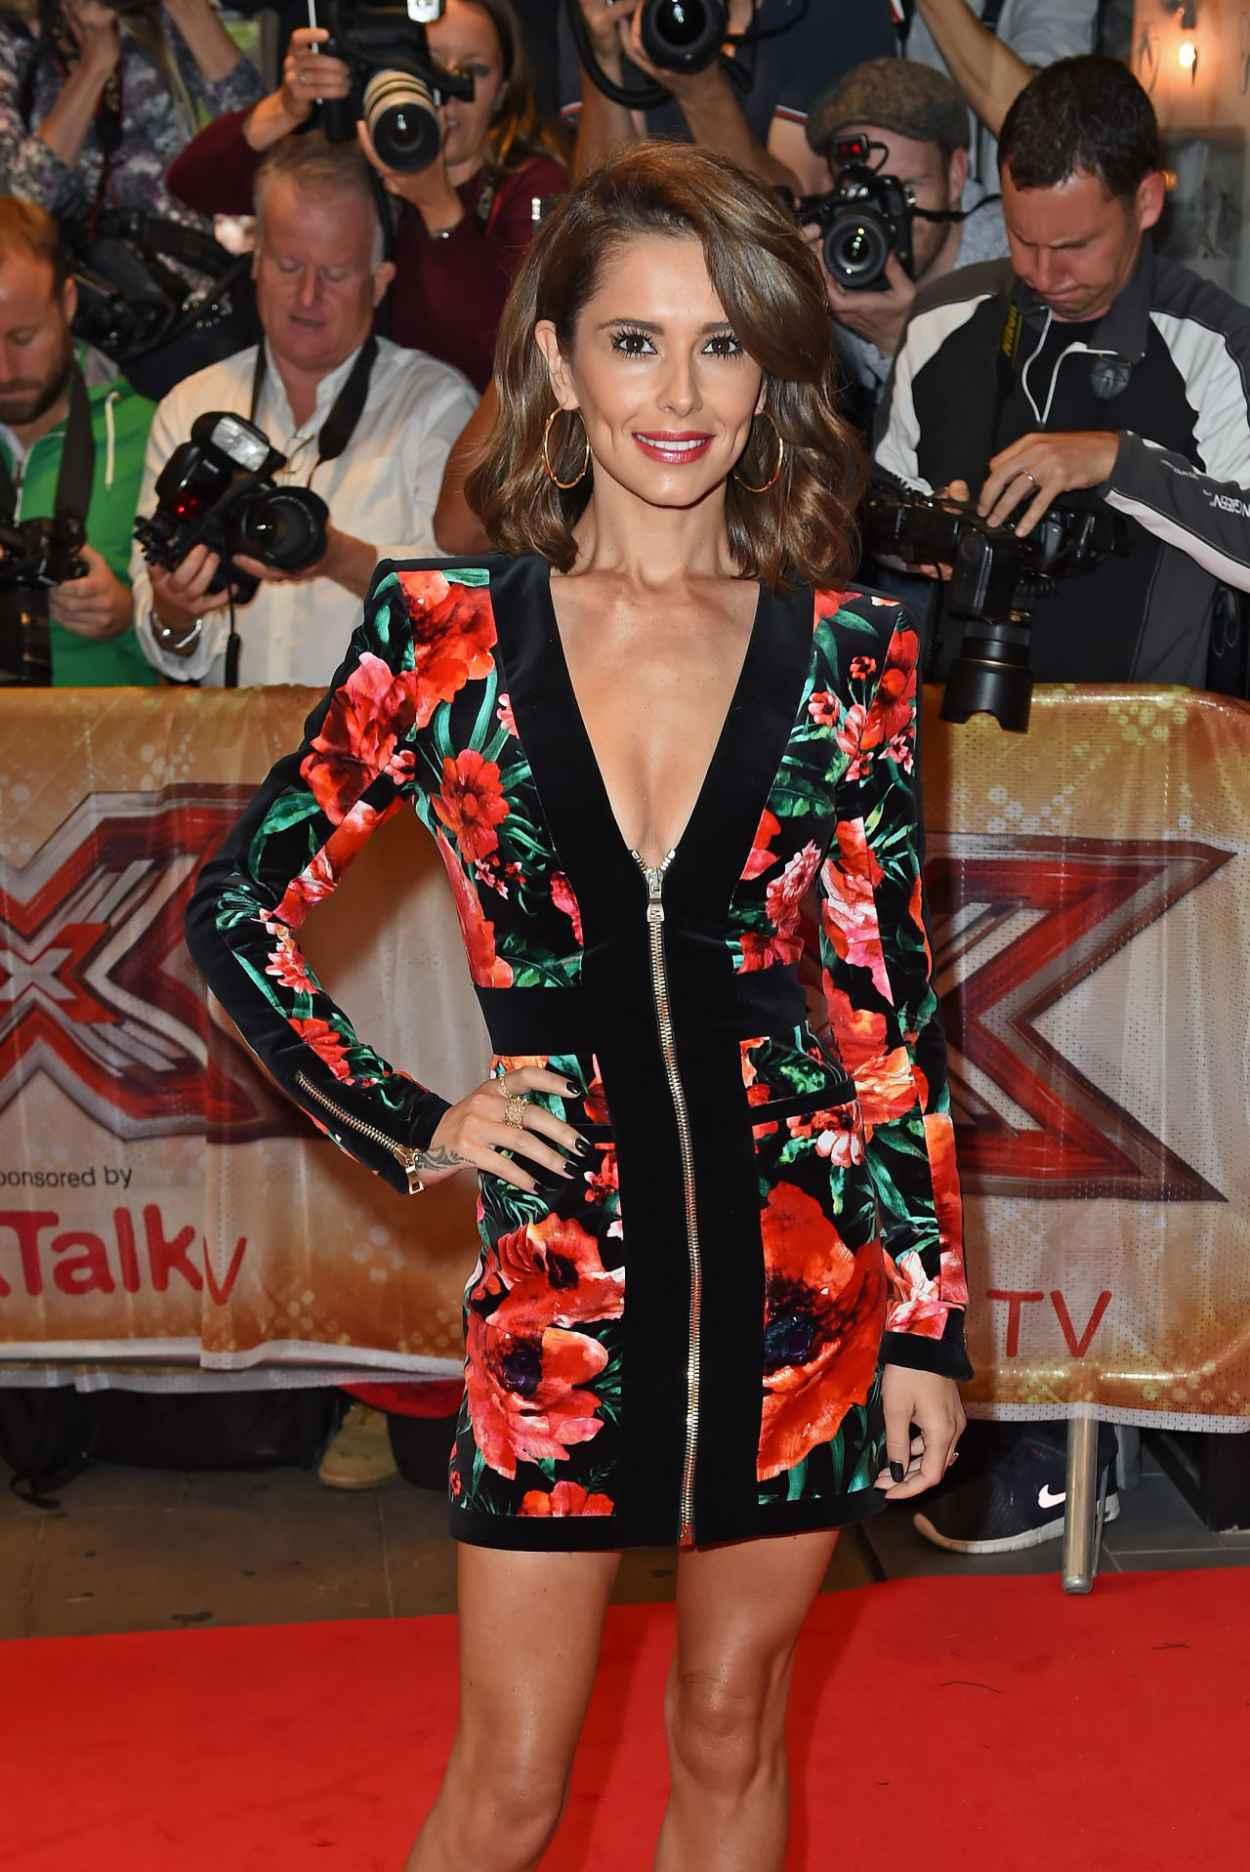 Cheryl Fernandez-Versini - The X-Factor Press Launch in London, August 2015-5